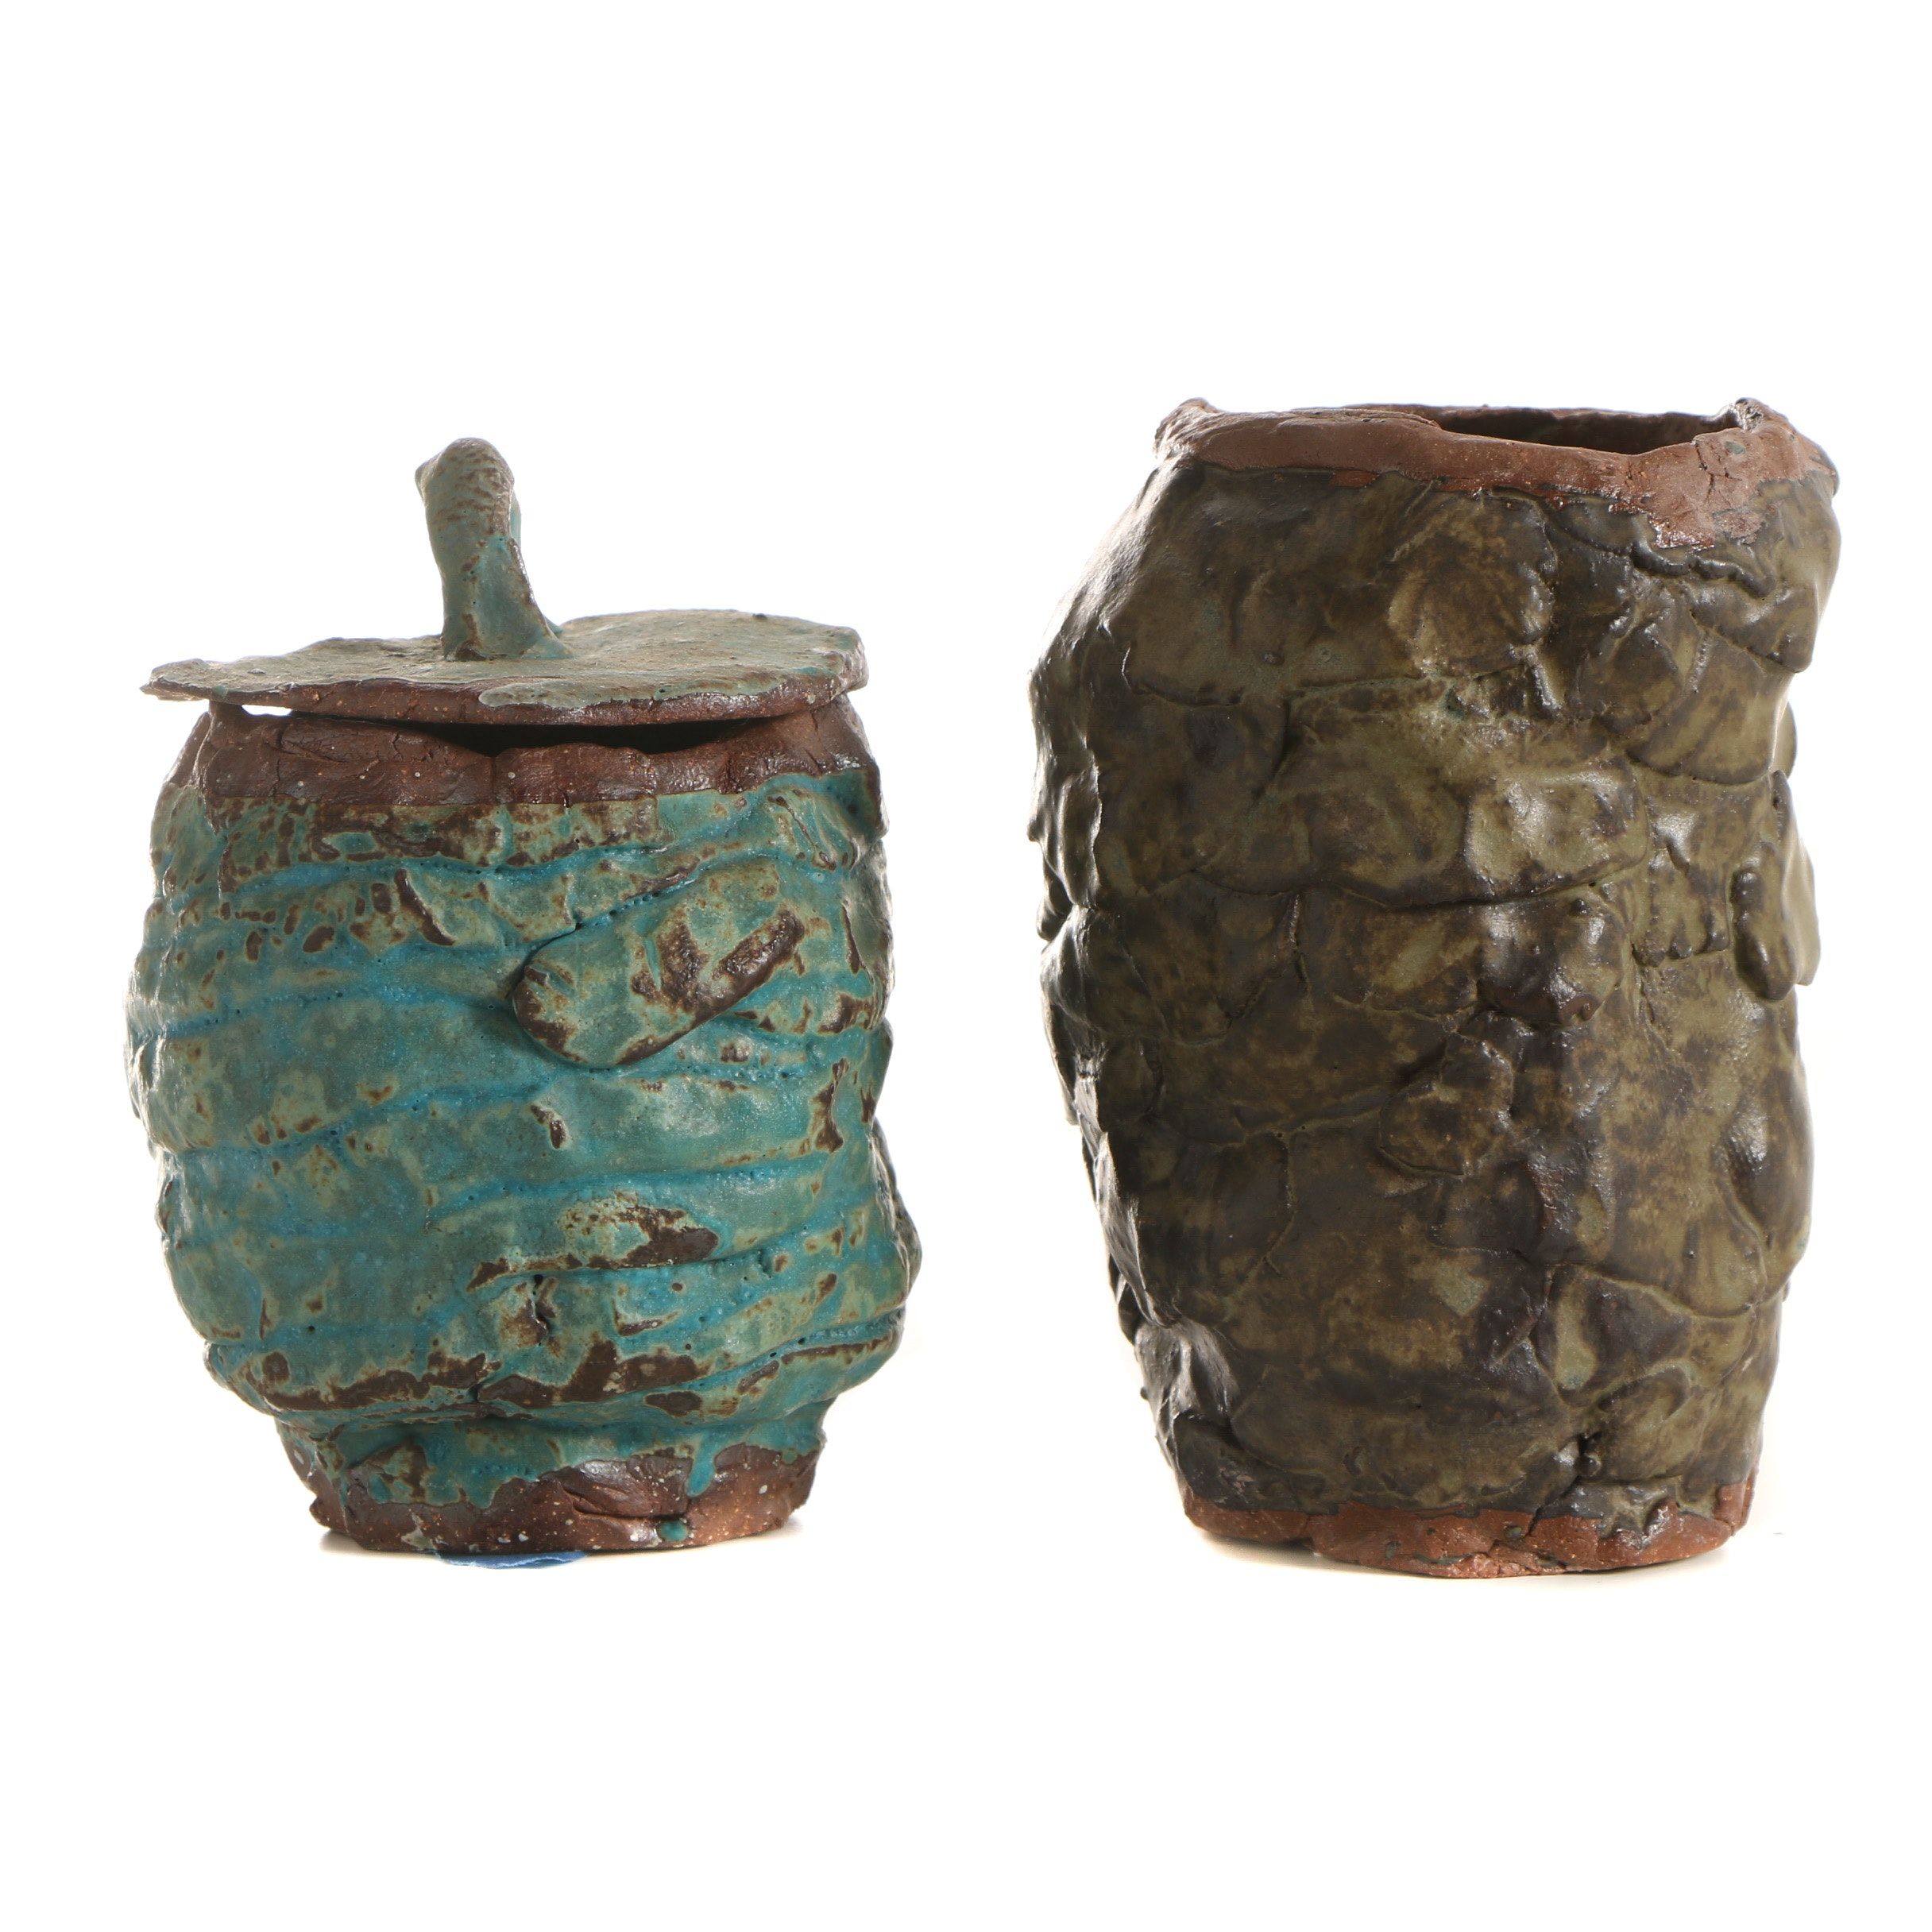 Stoneware Vessels Attributed to Seth Tuska